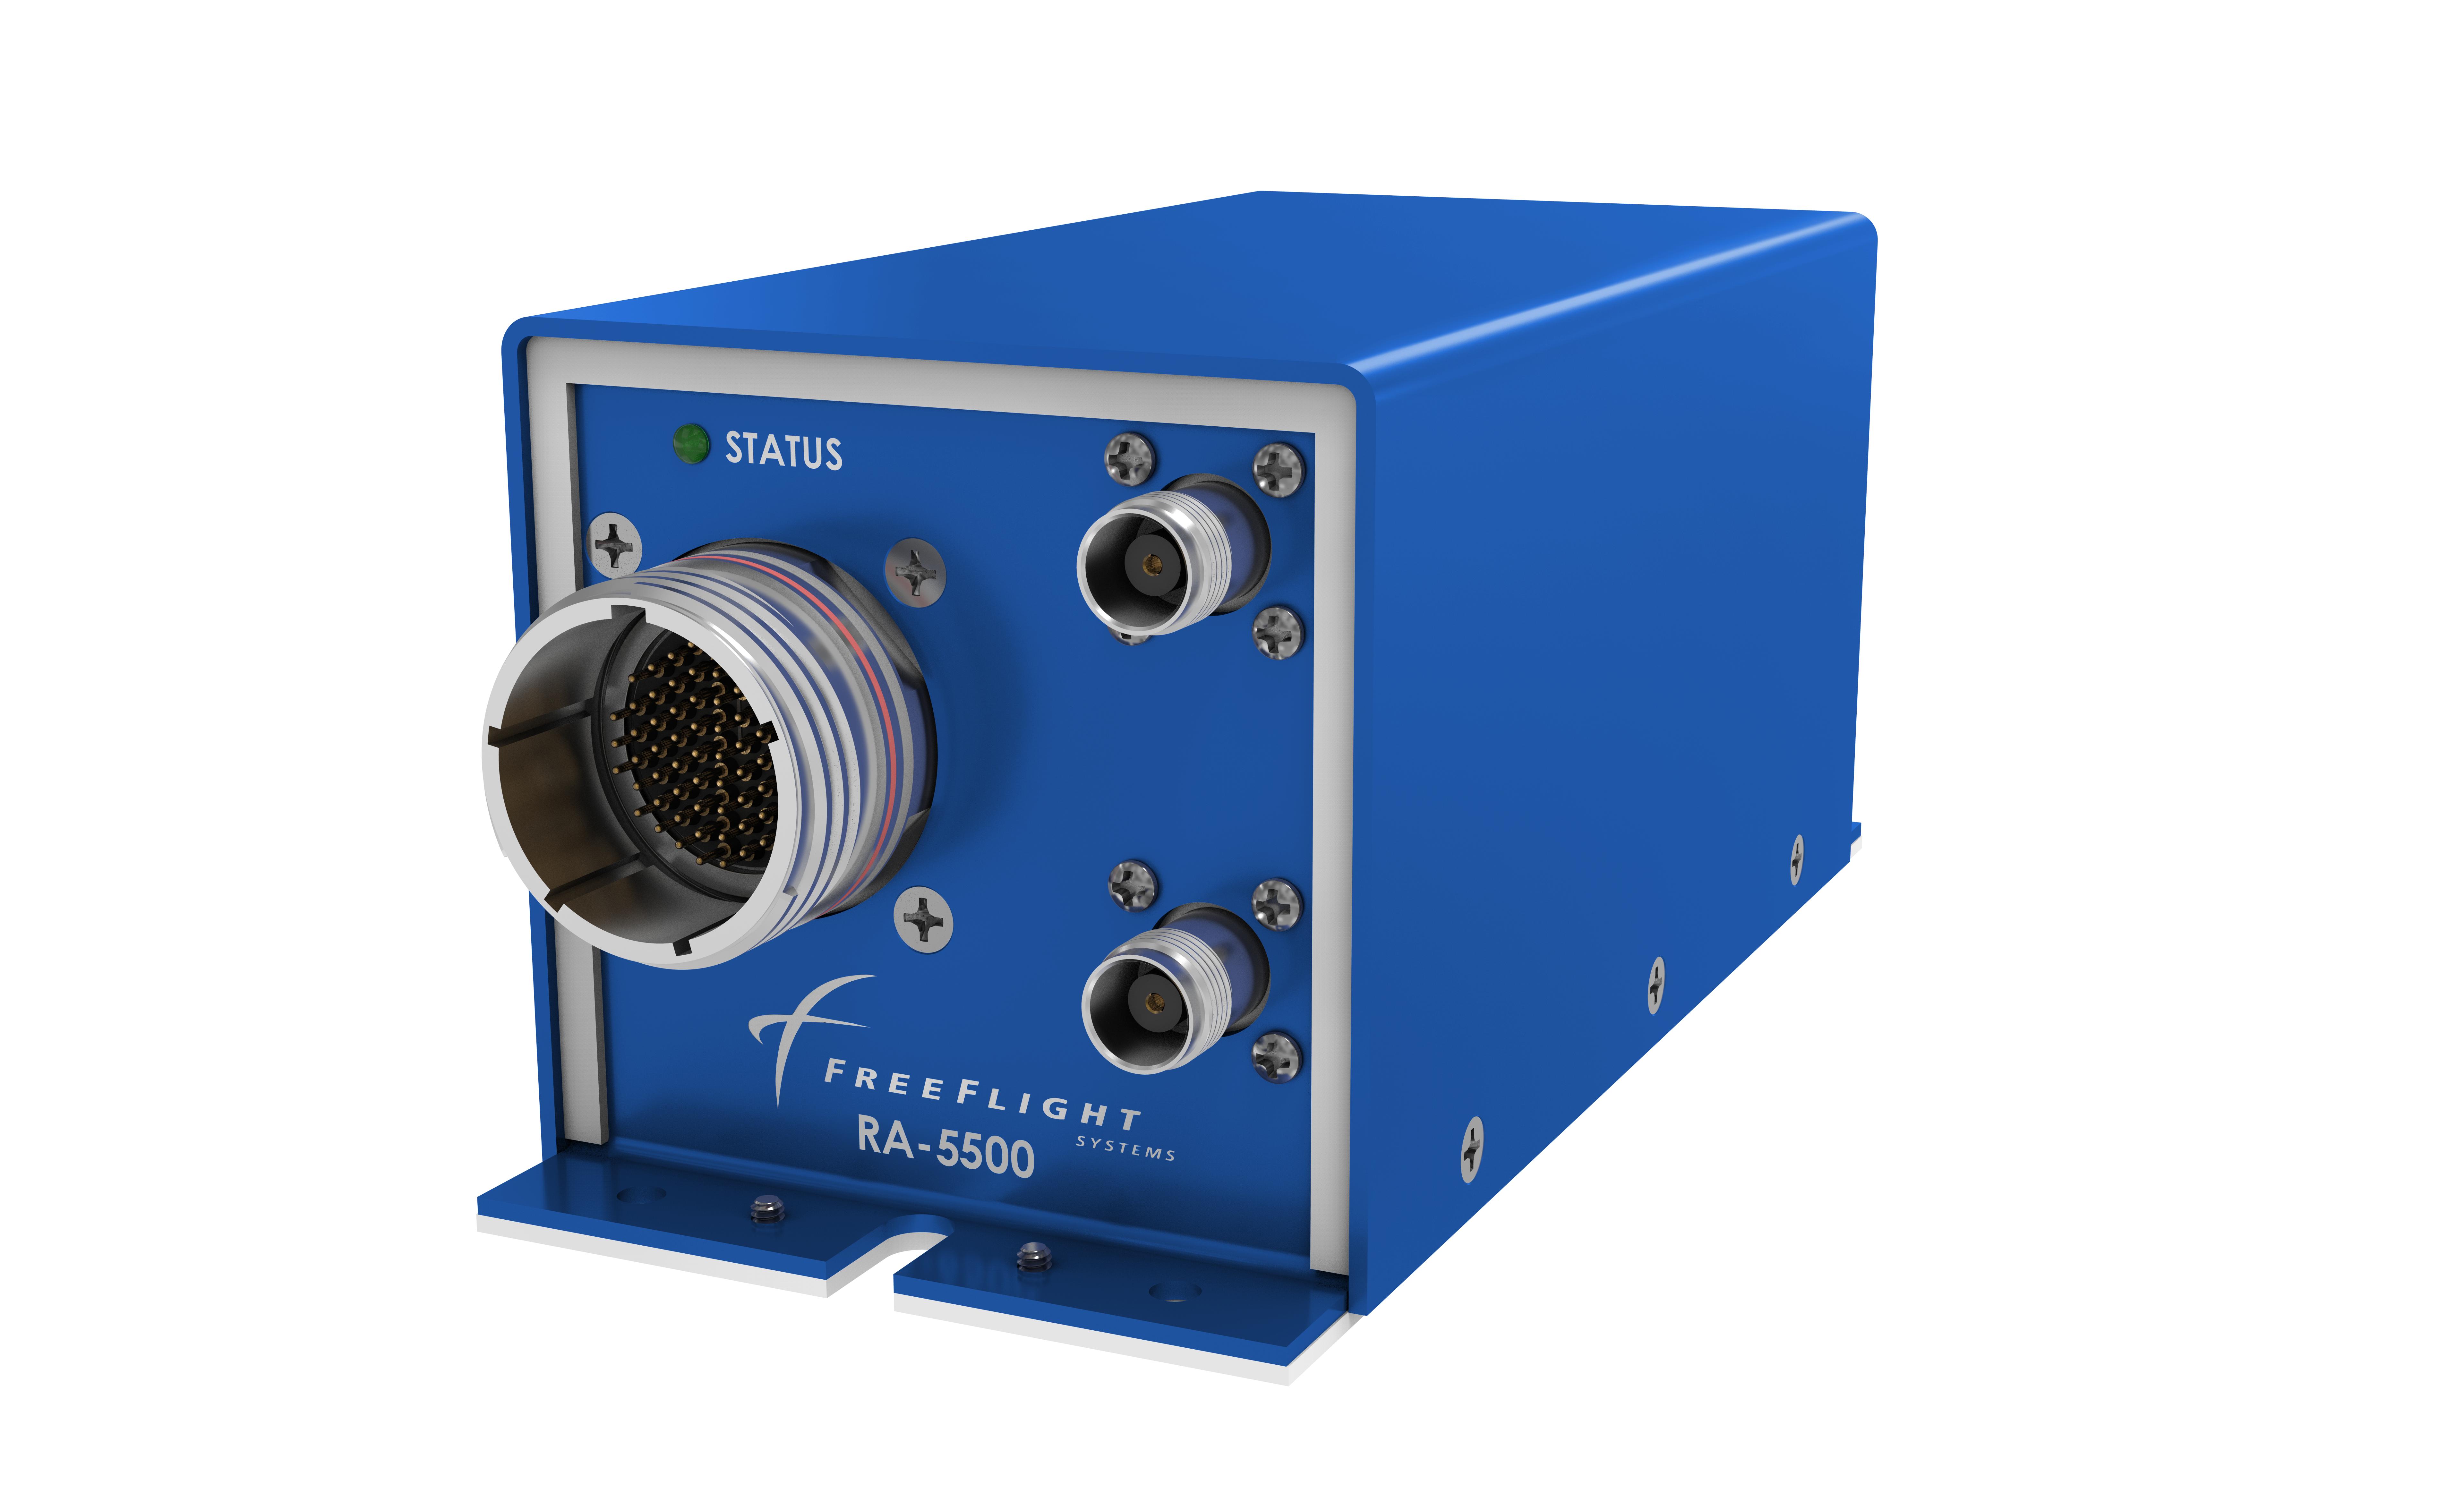 freeflight-systems-ra-5500-radar-altimeter